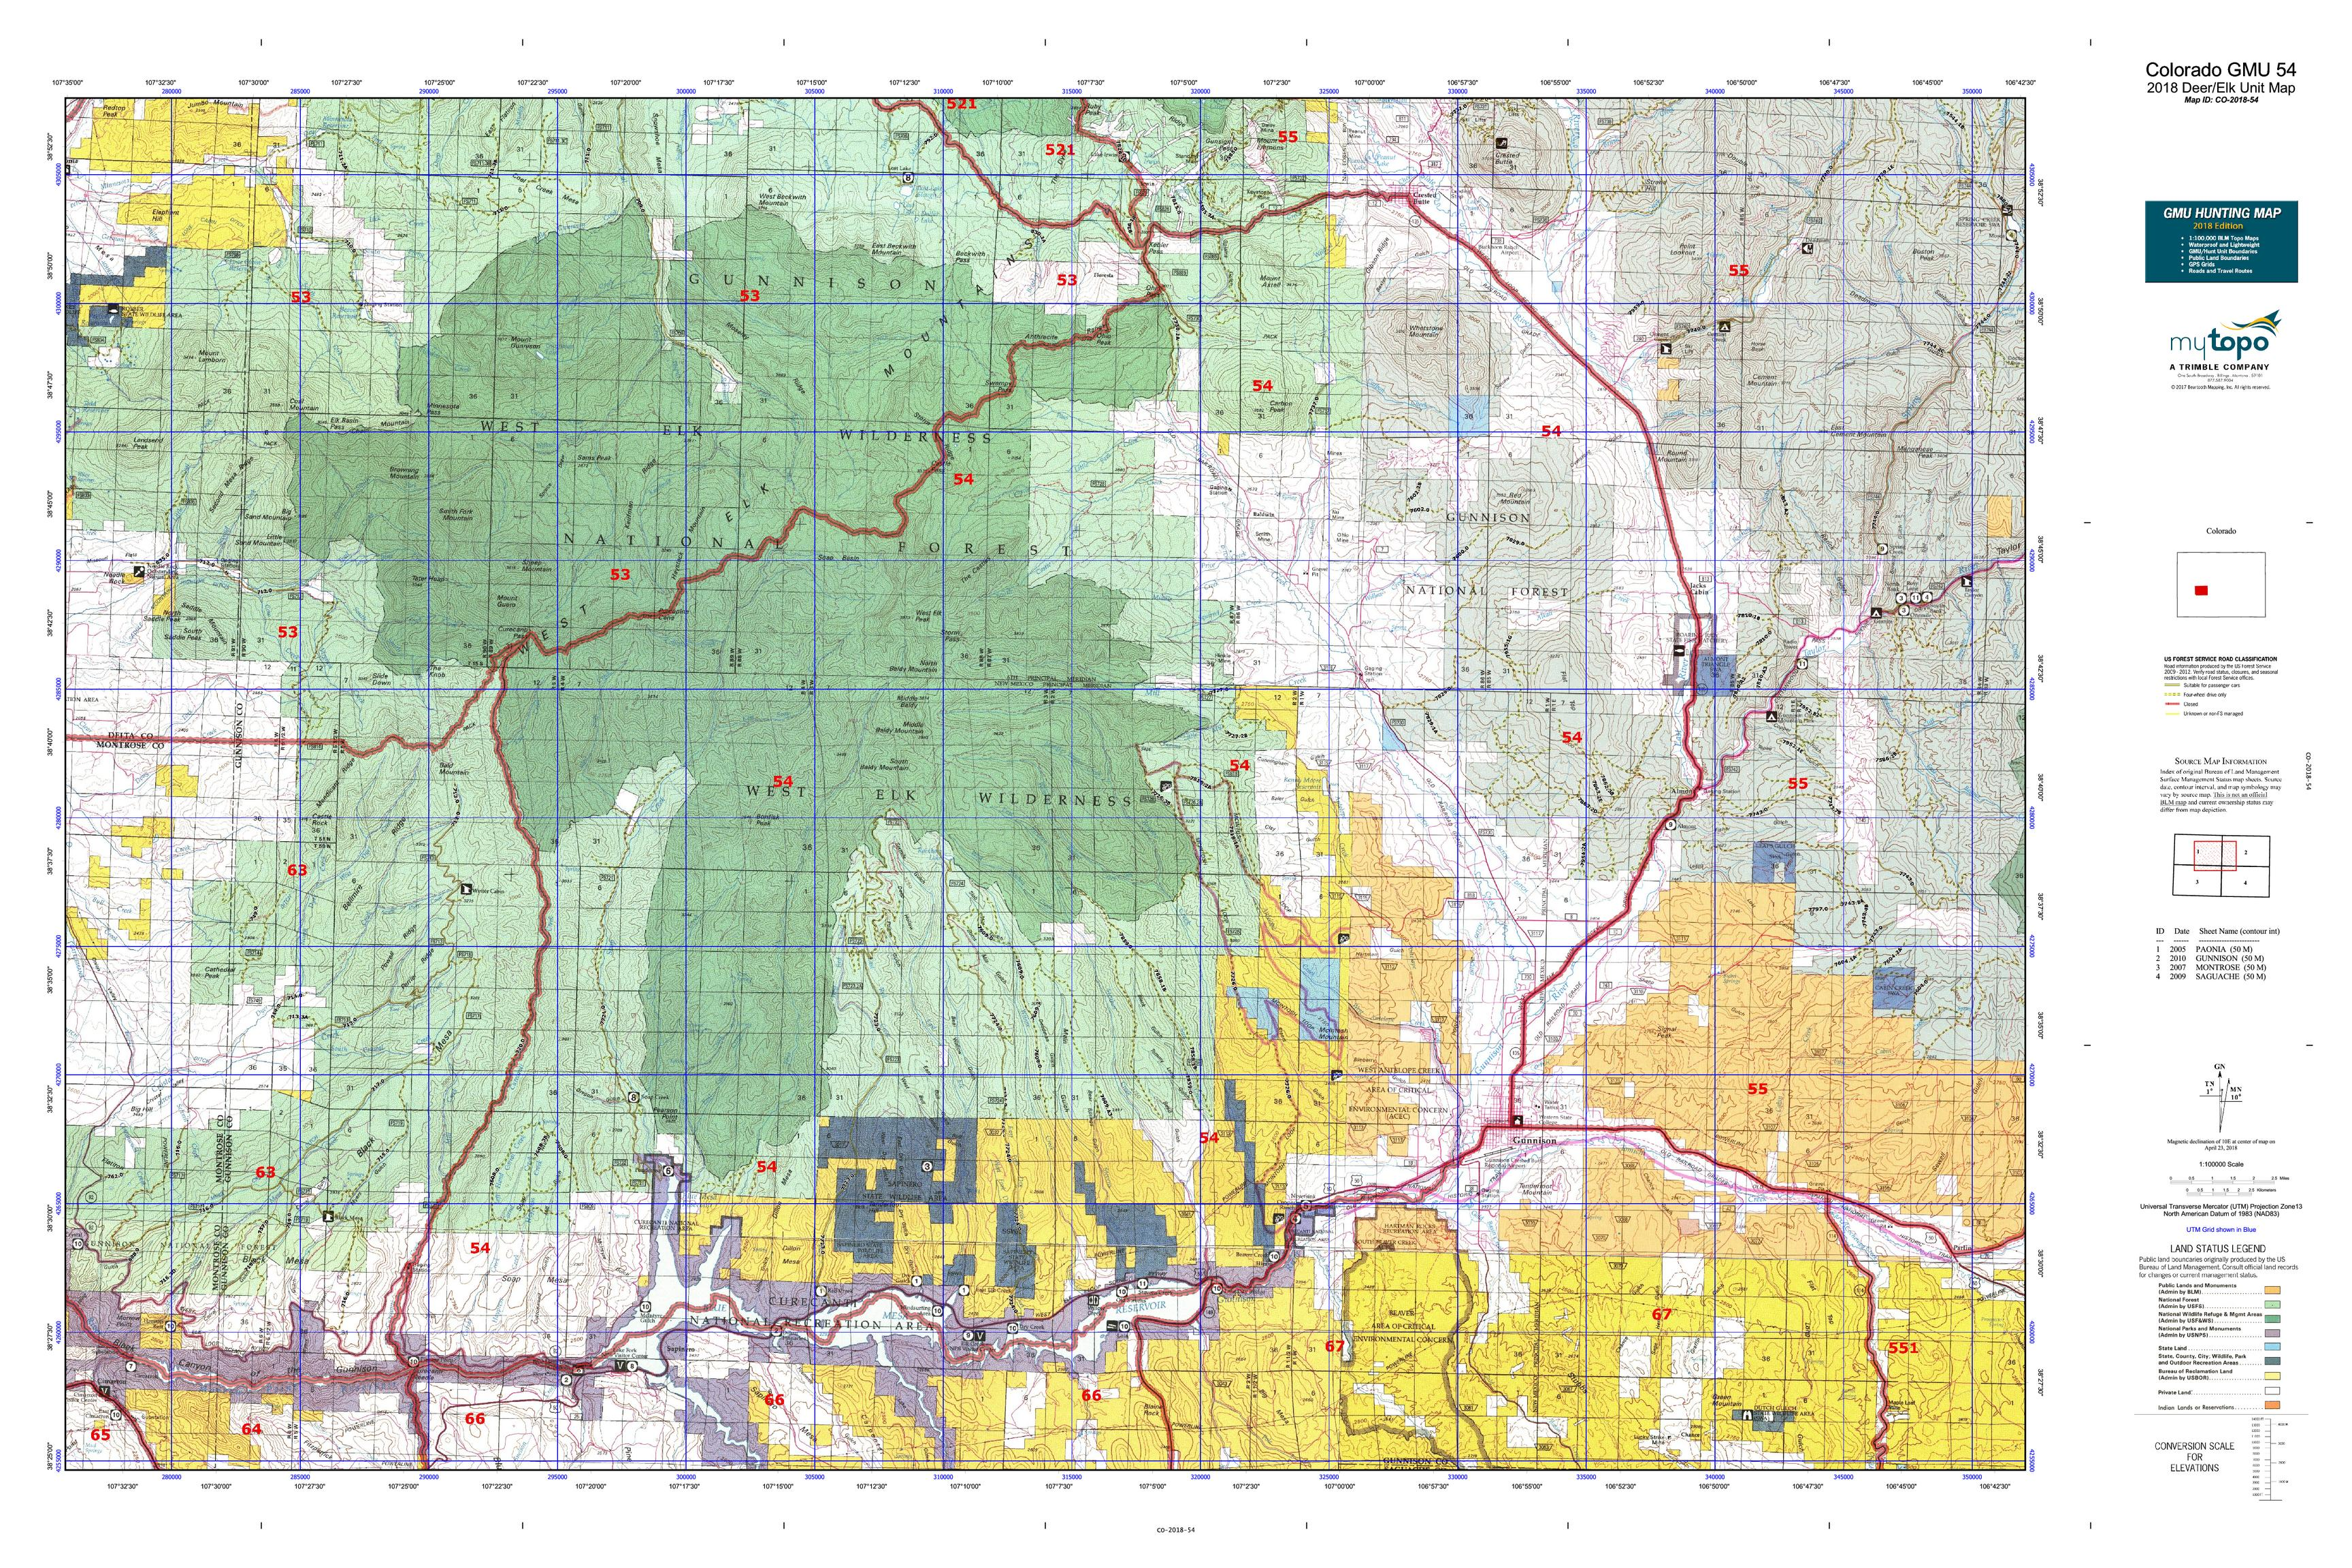 Colorado Gmu Map Colorado GMU 54 Map | MyTopo